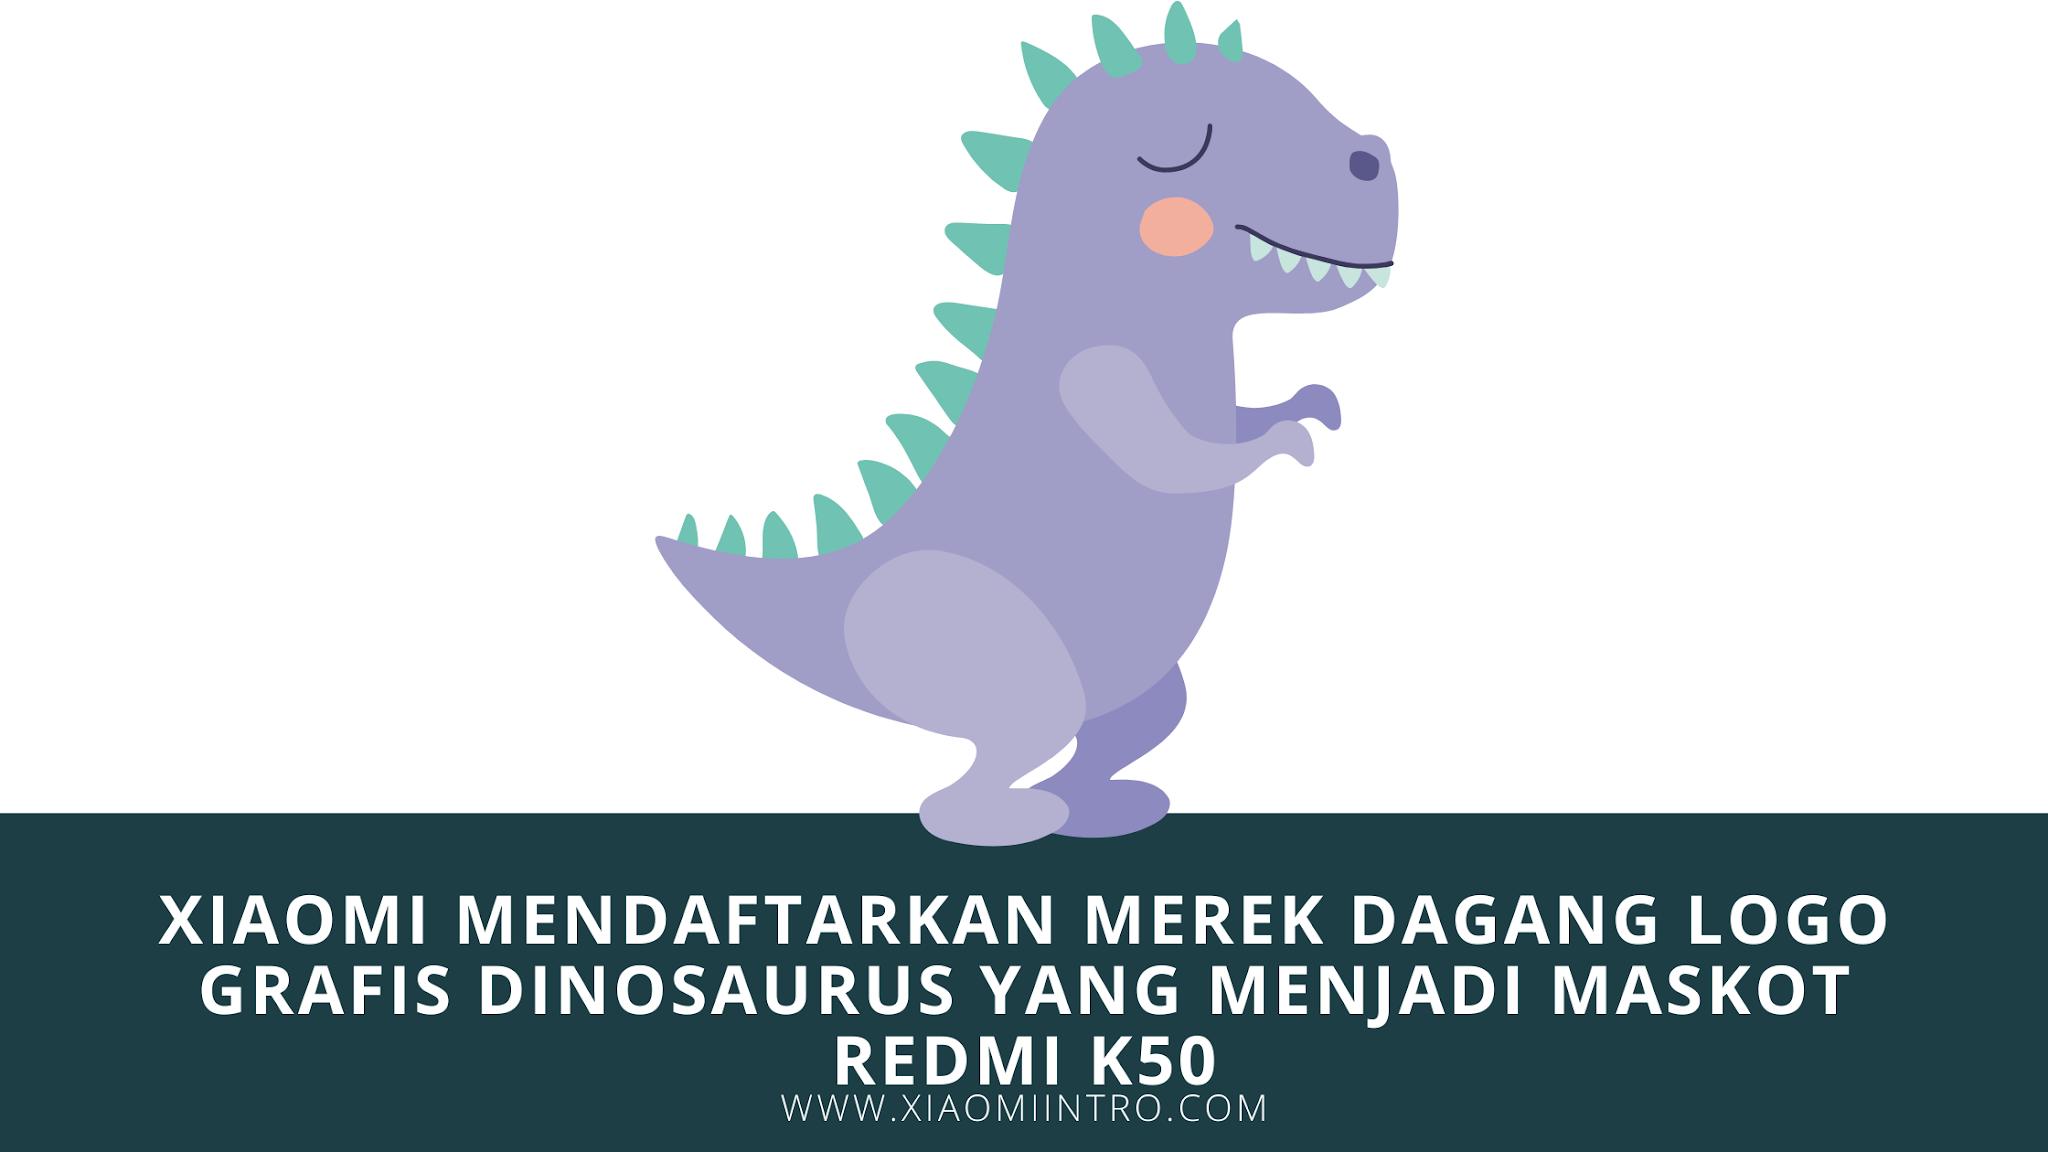 Xiaomi Mendaftarkan Merek Dagang Logo Grafis Dinosaurus Yang Menjadi Maskot Redmi K50